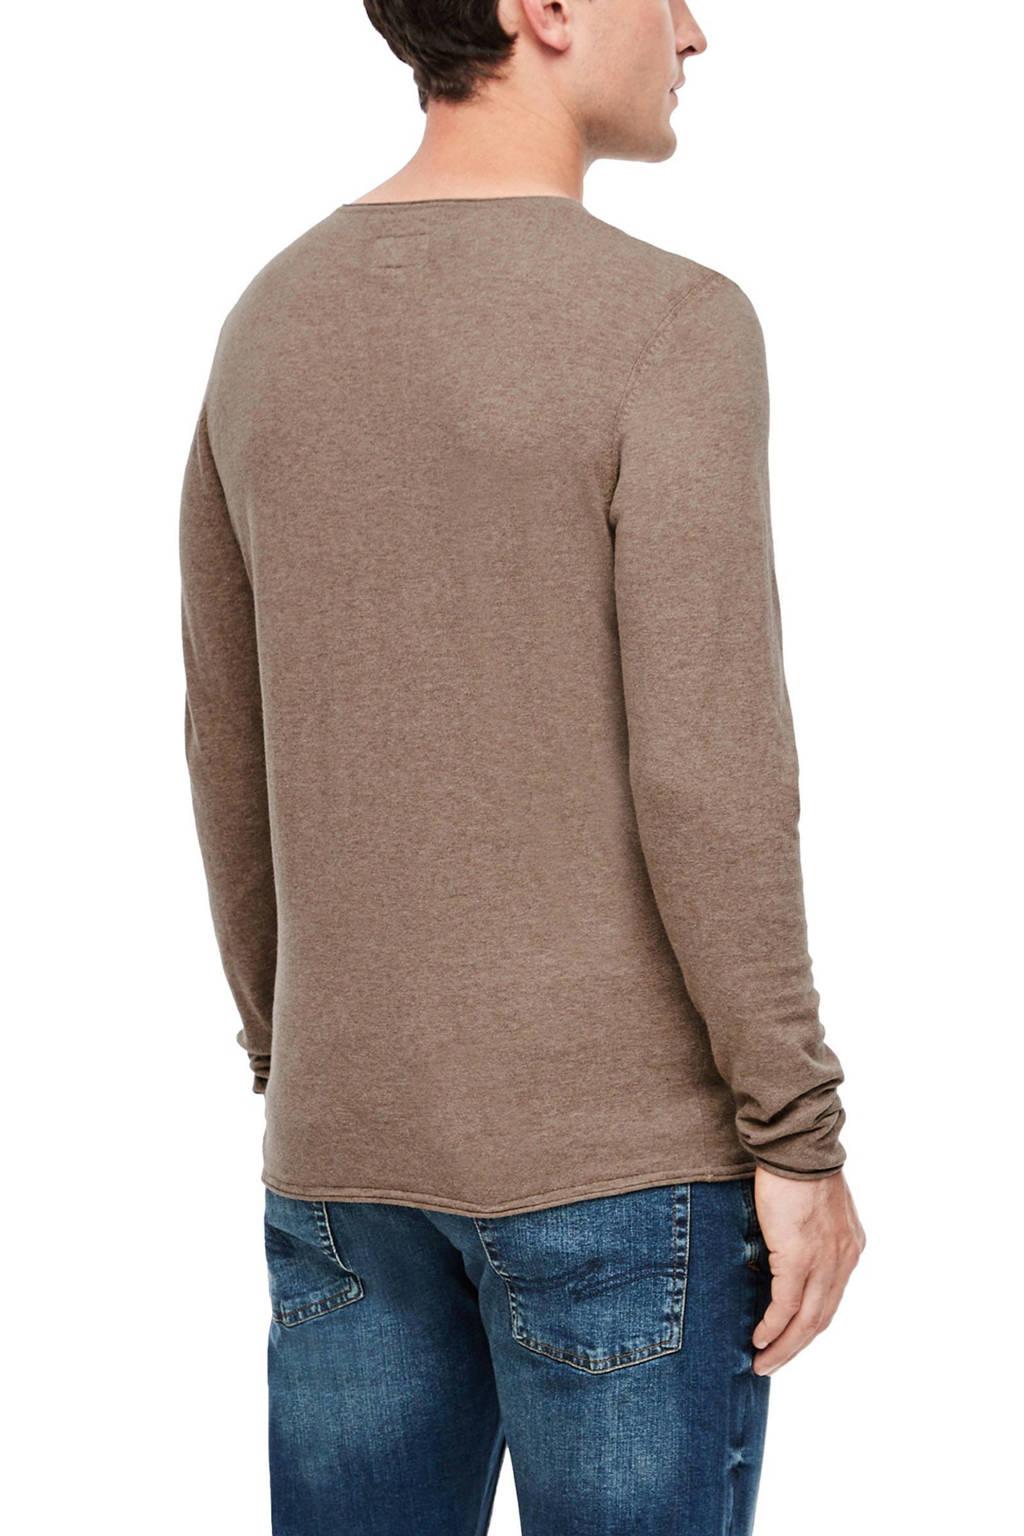 Q/S designed by gemêleerde trui beige, Beige